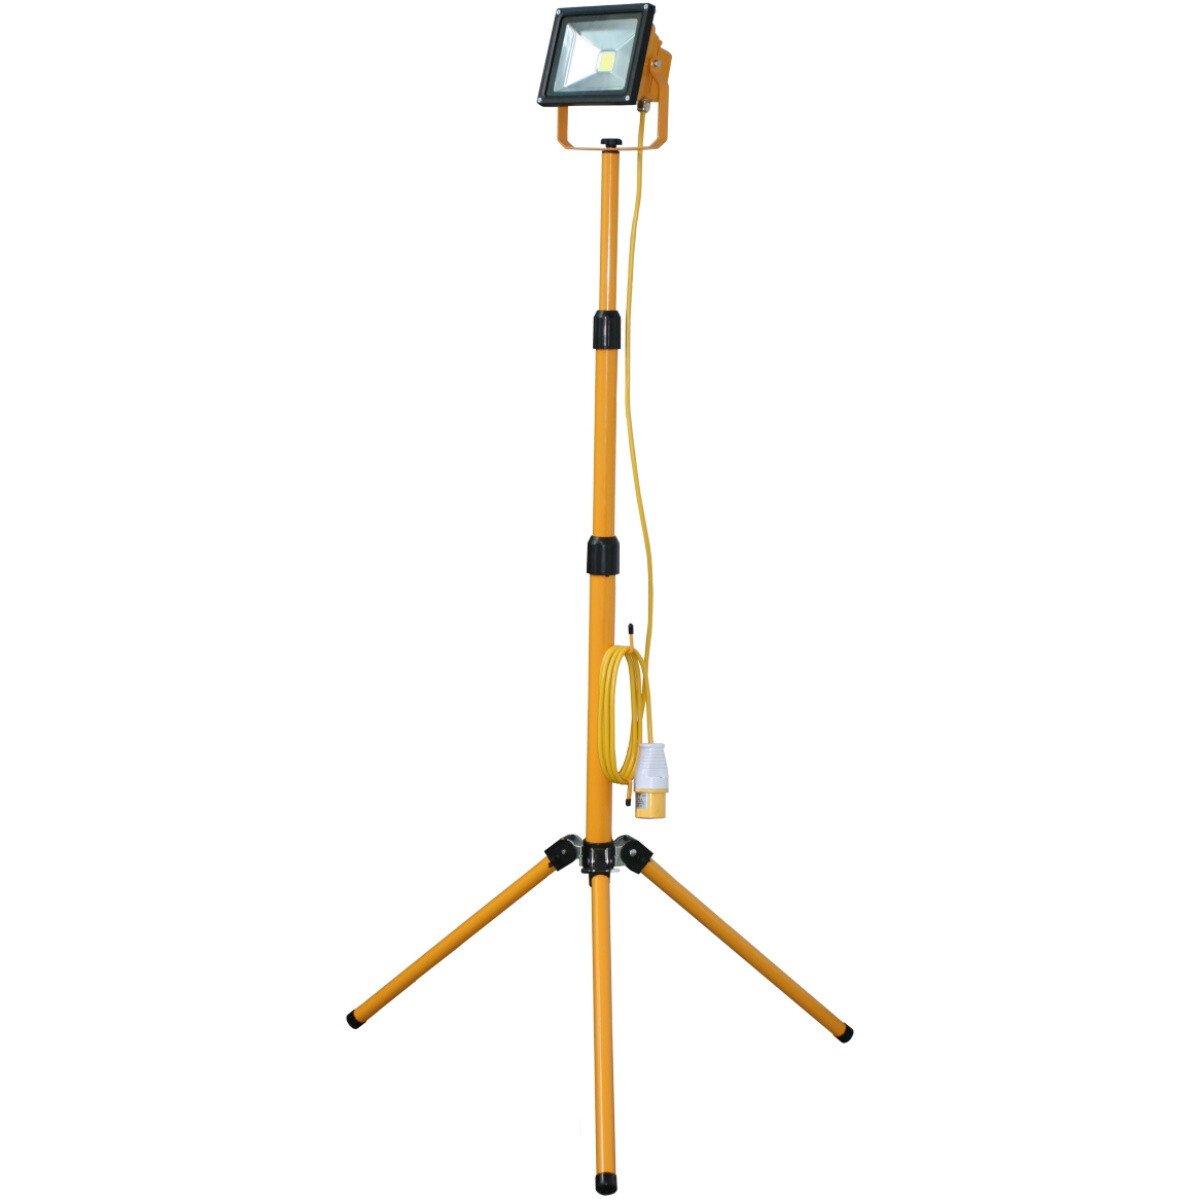 Spectre SP-17190 110V STD 20W COB LED Floodlight Work Light